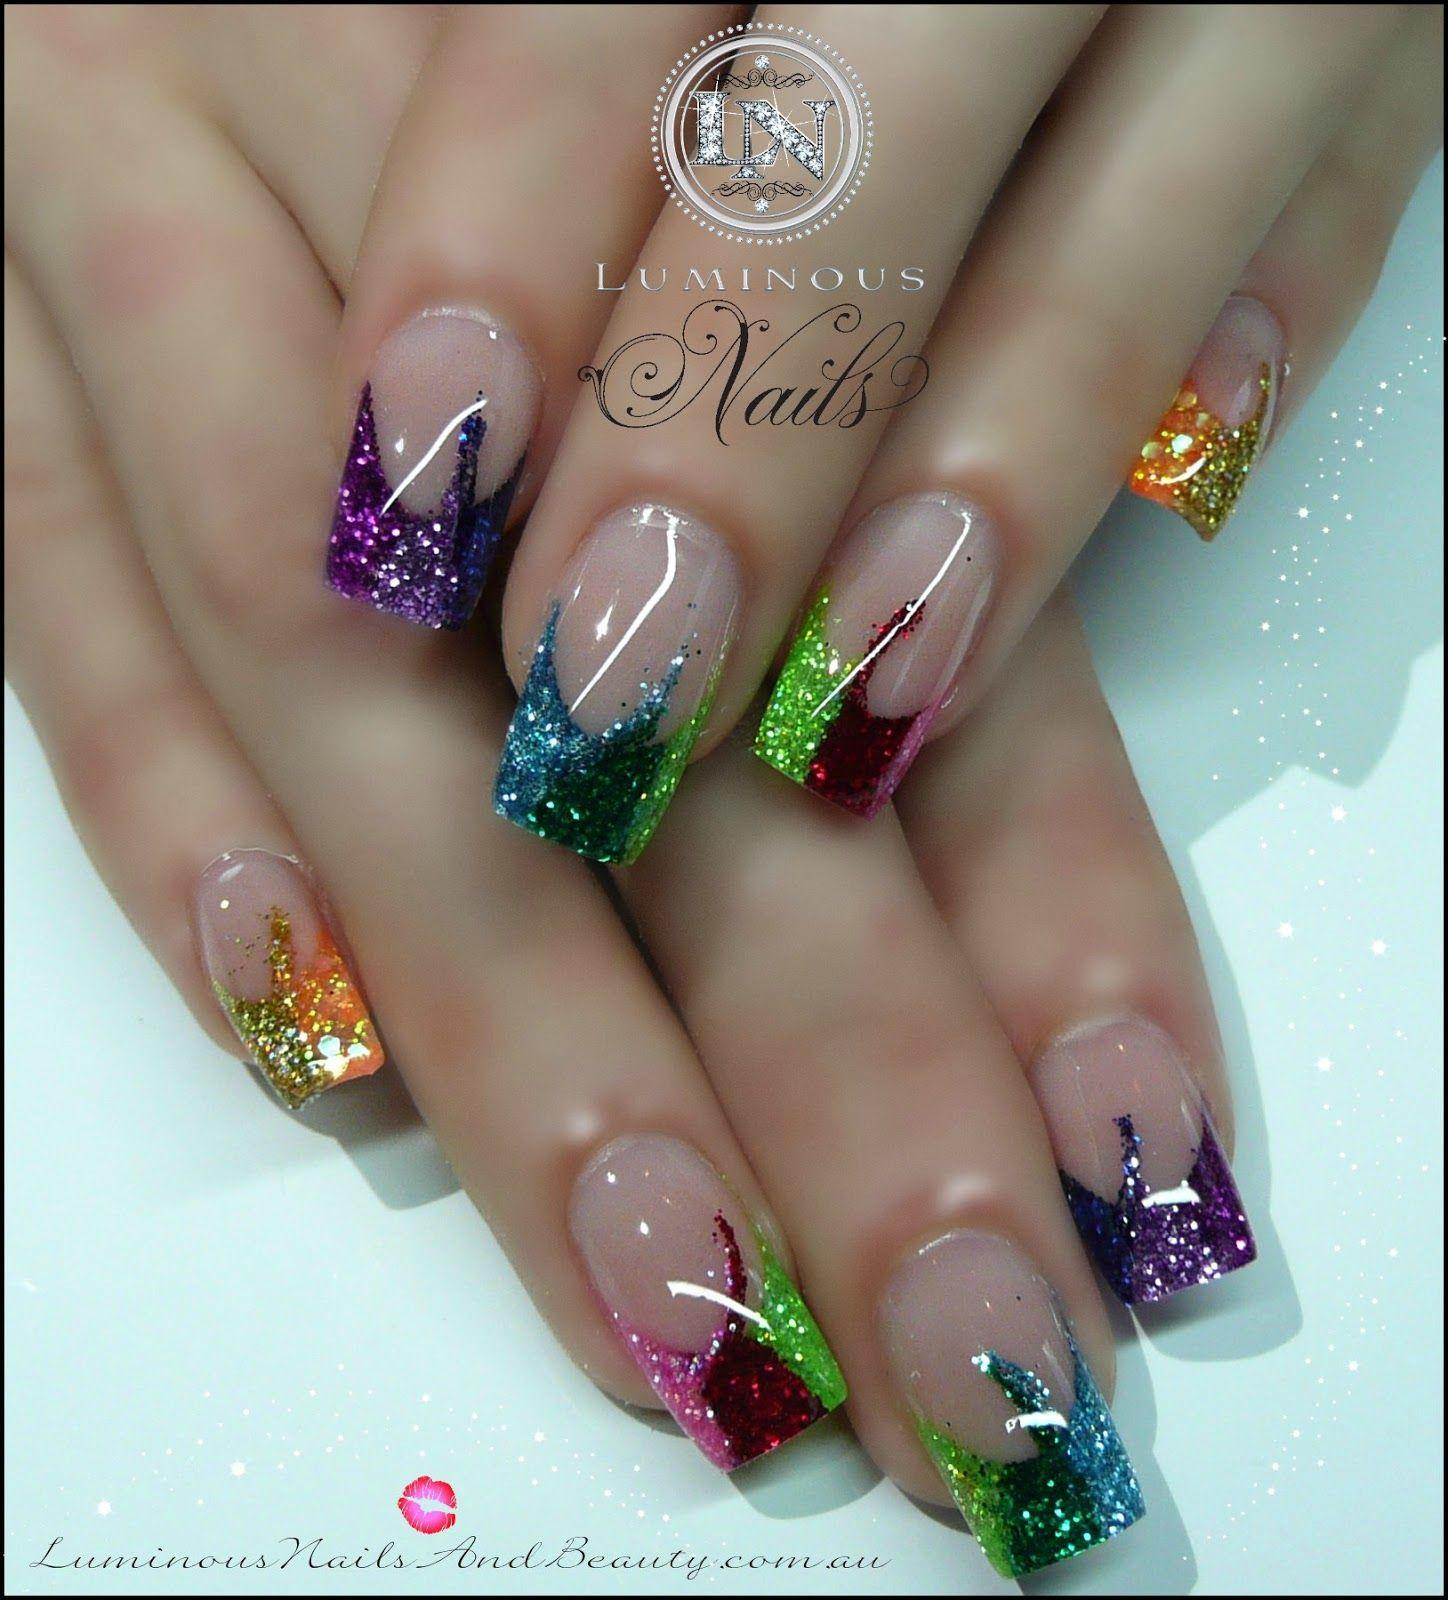 luminous nail and beauty | Luminous+Nails+and+Beauty,+Gold+Coast+ ...